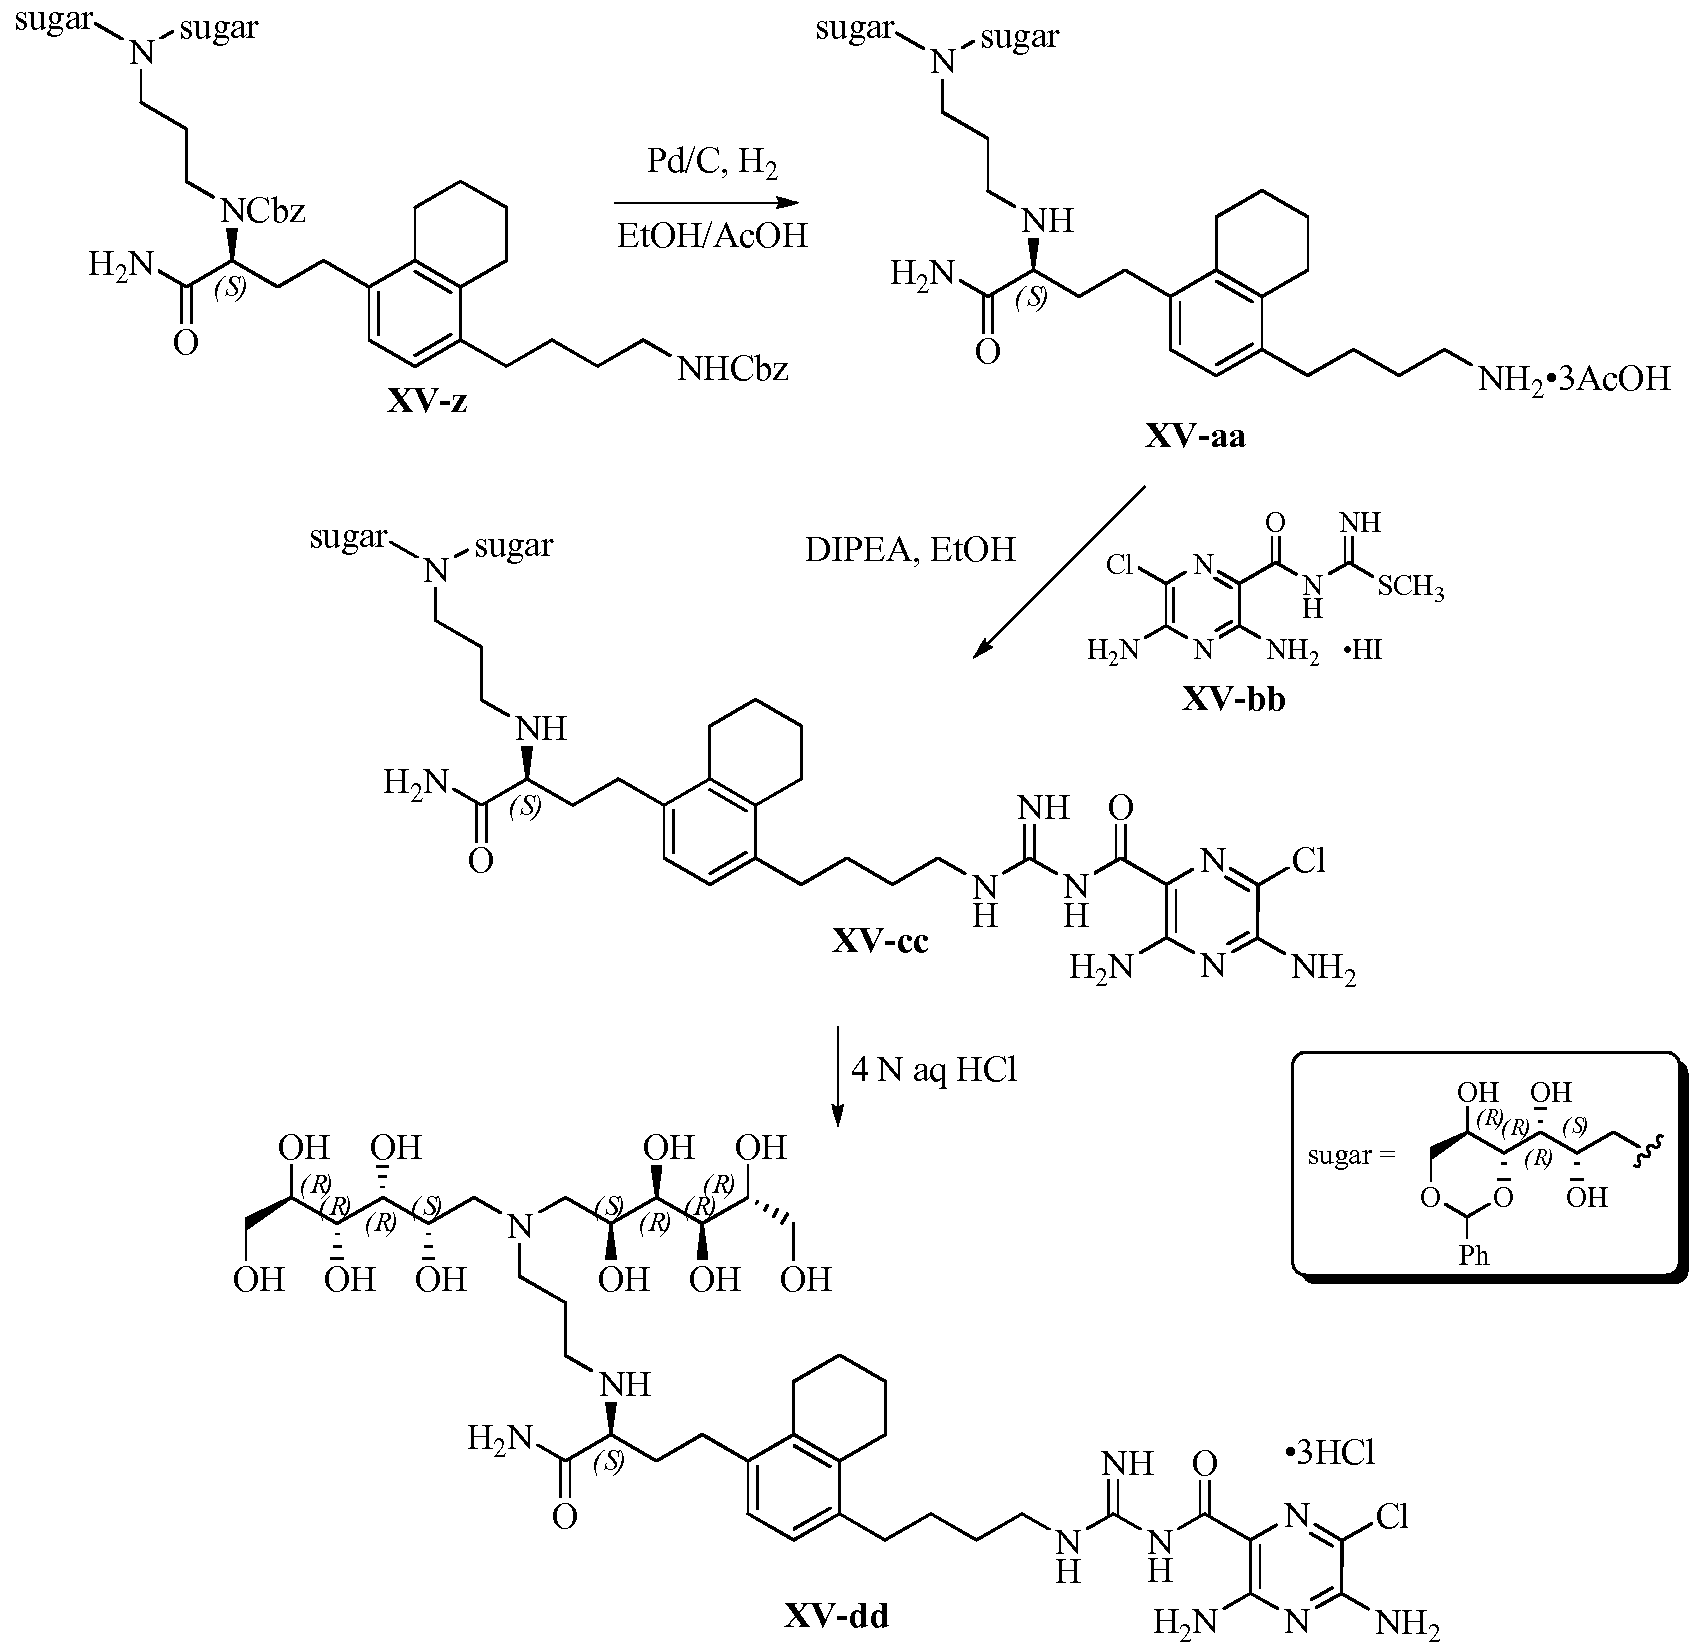 WO2014099673A1 - 3,5-diamino-6-chloro-n-(n-(4-phenylbutyl